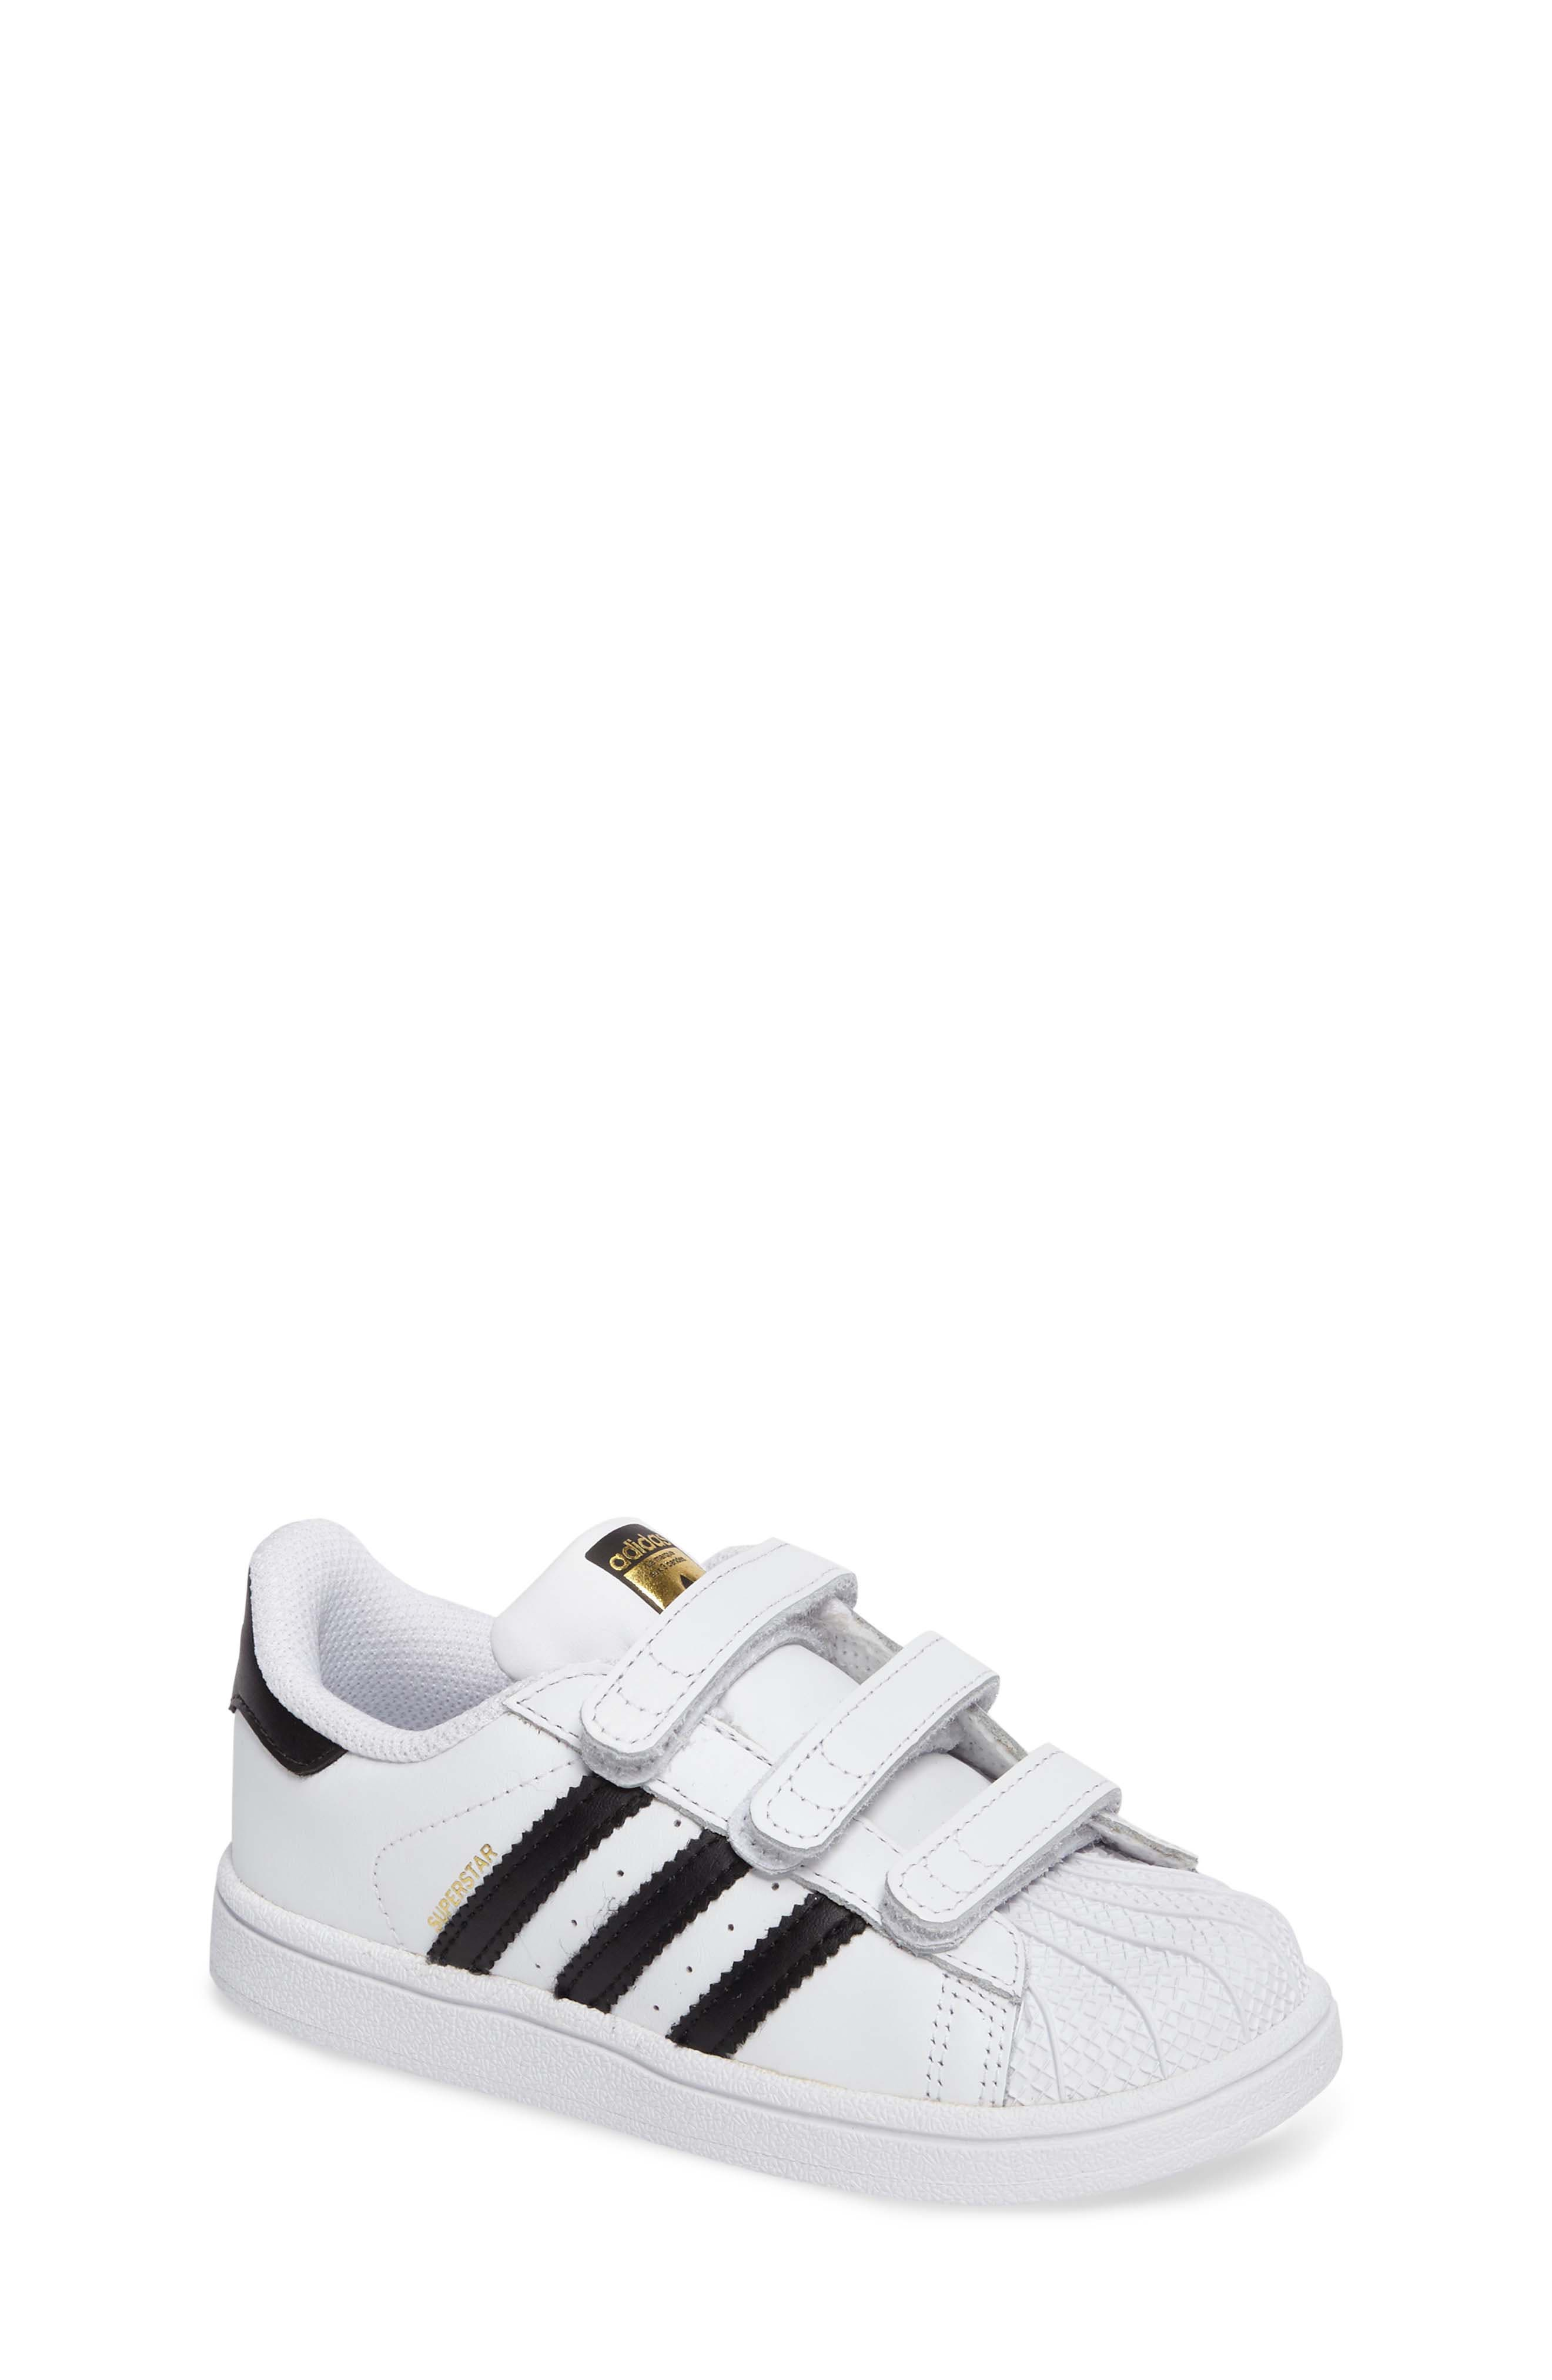 ADIDAS, Superstar Sneaker, Main thumbnail 1, color, WHITE/ BLACK/ WHITE